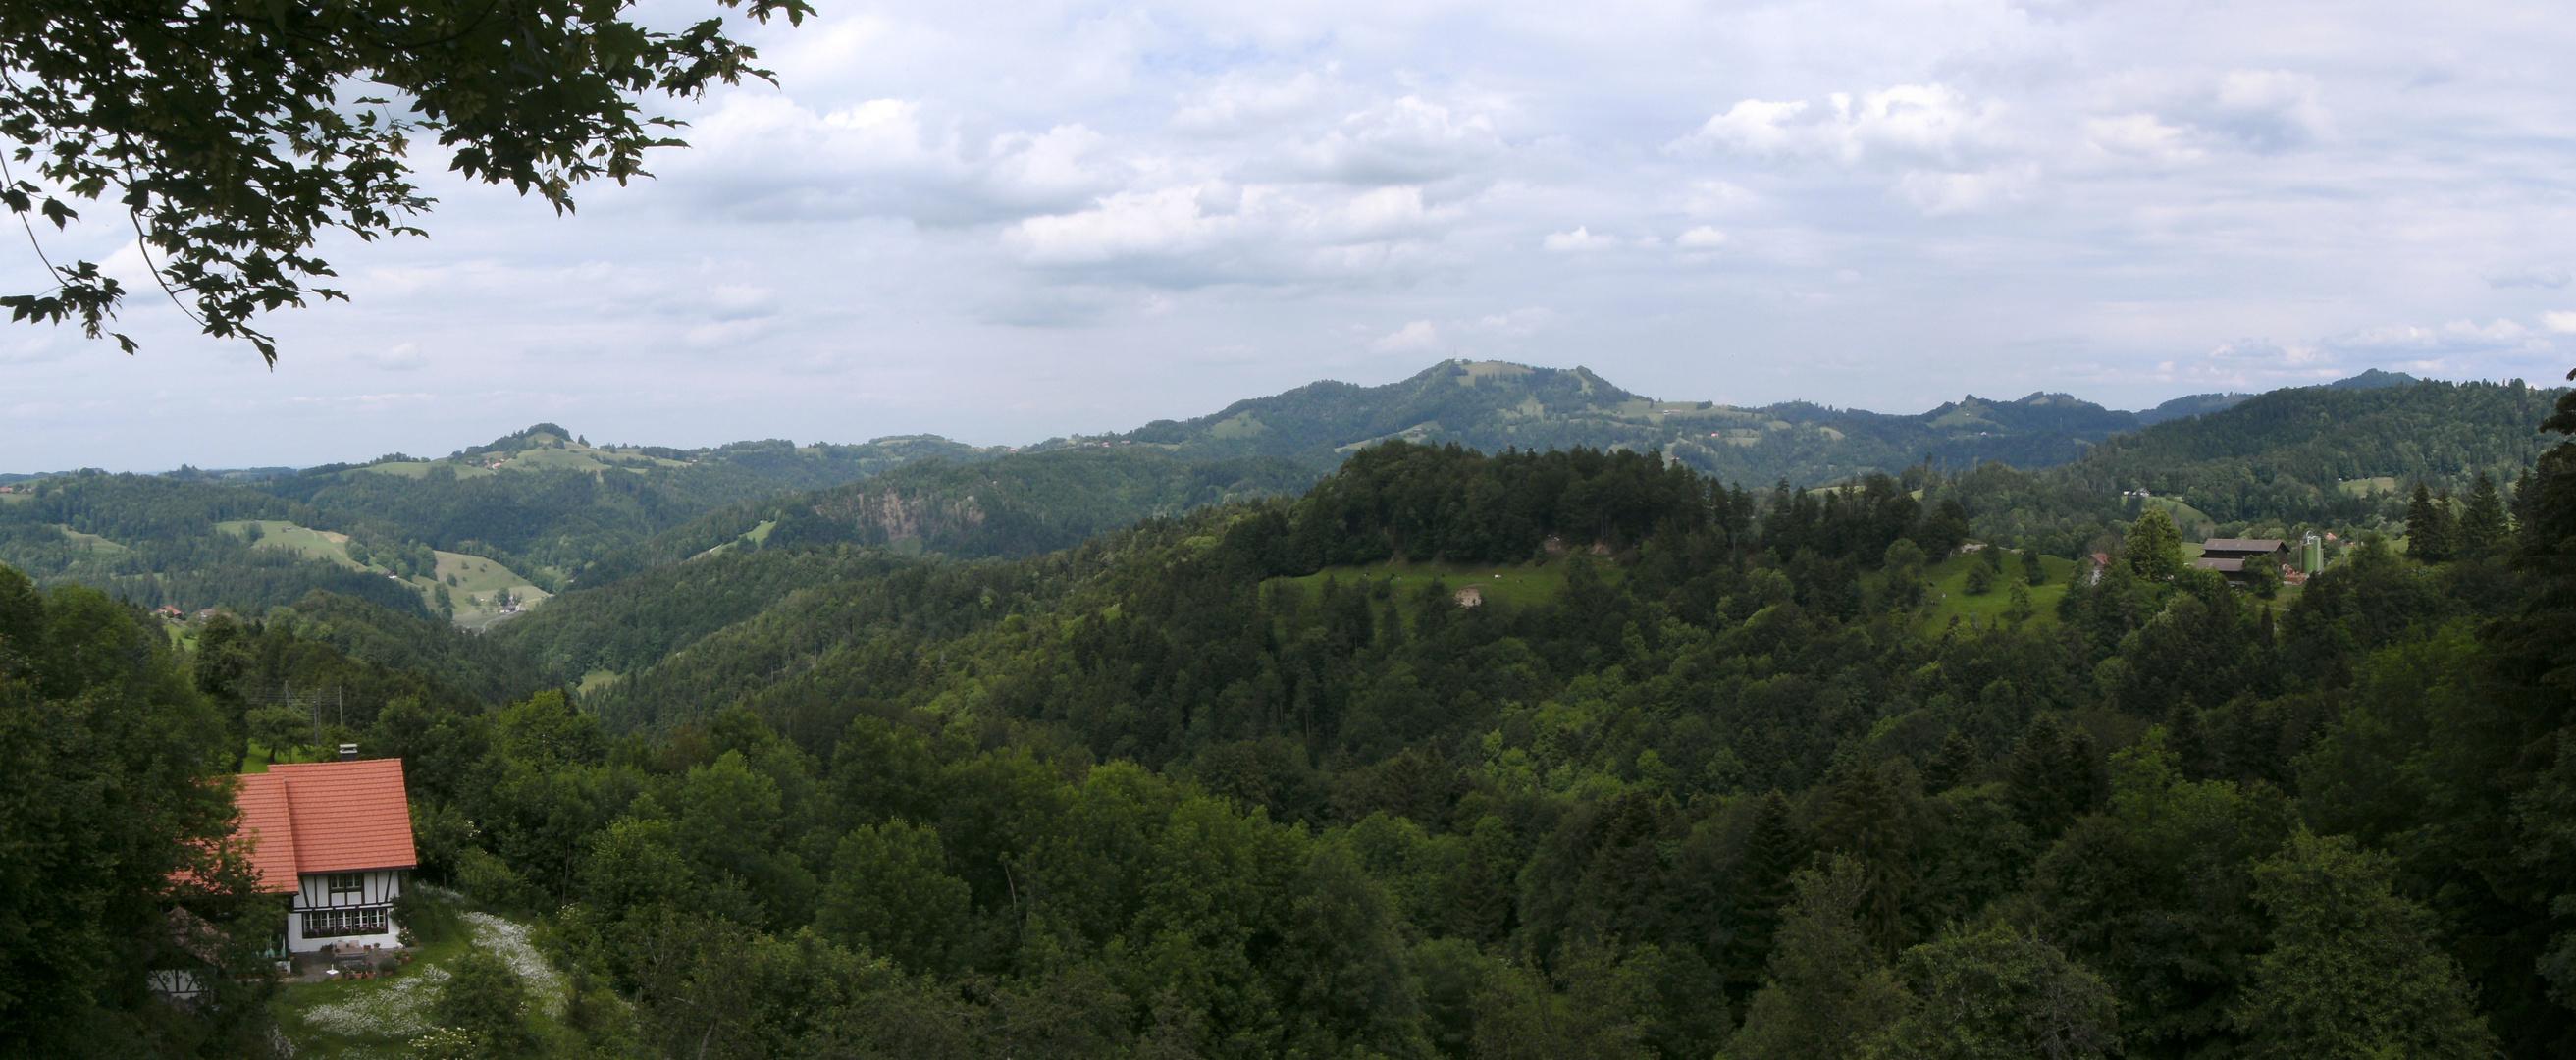 Zürcher Oberland Panorama